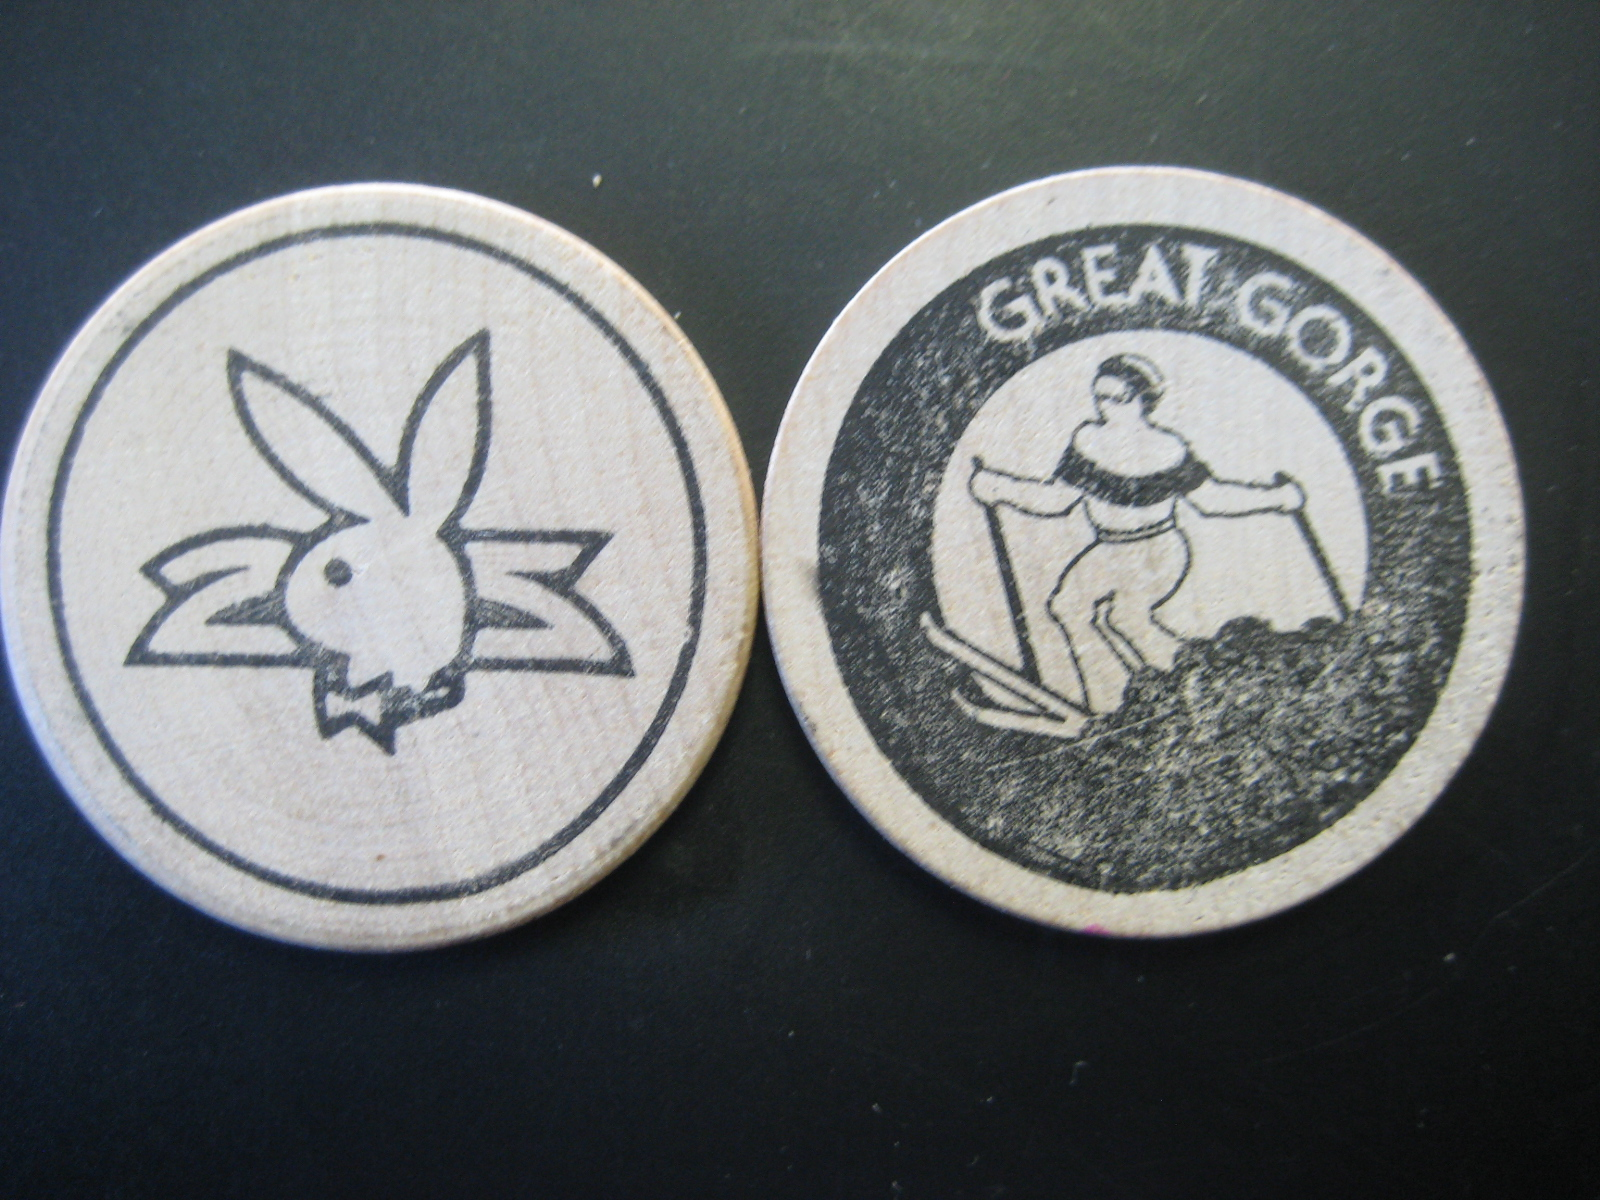 Great Gorge Playboy Club Wooden Nickel